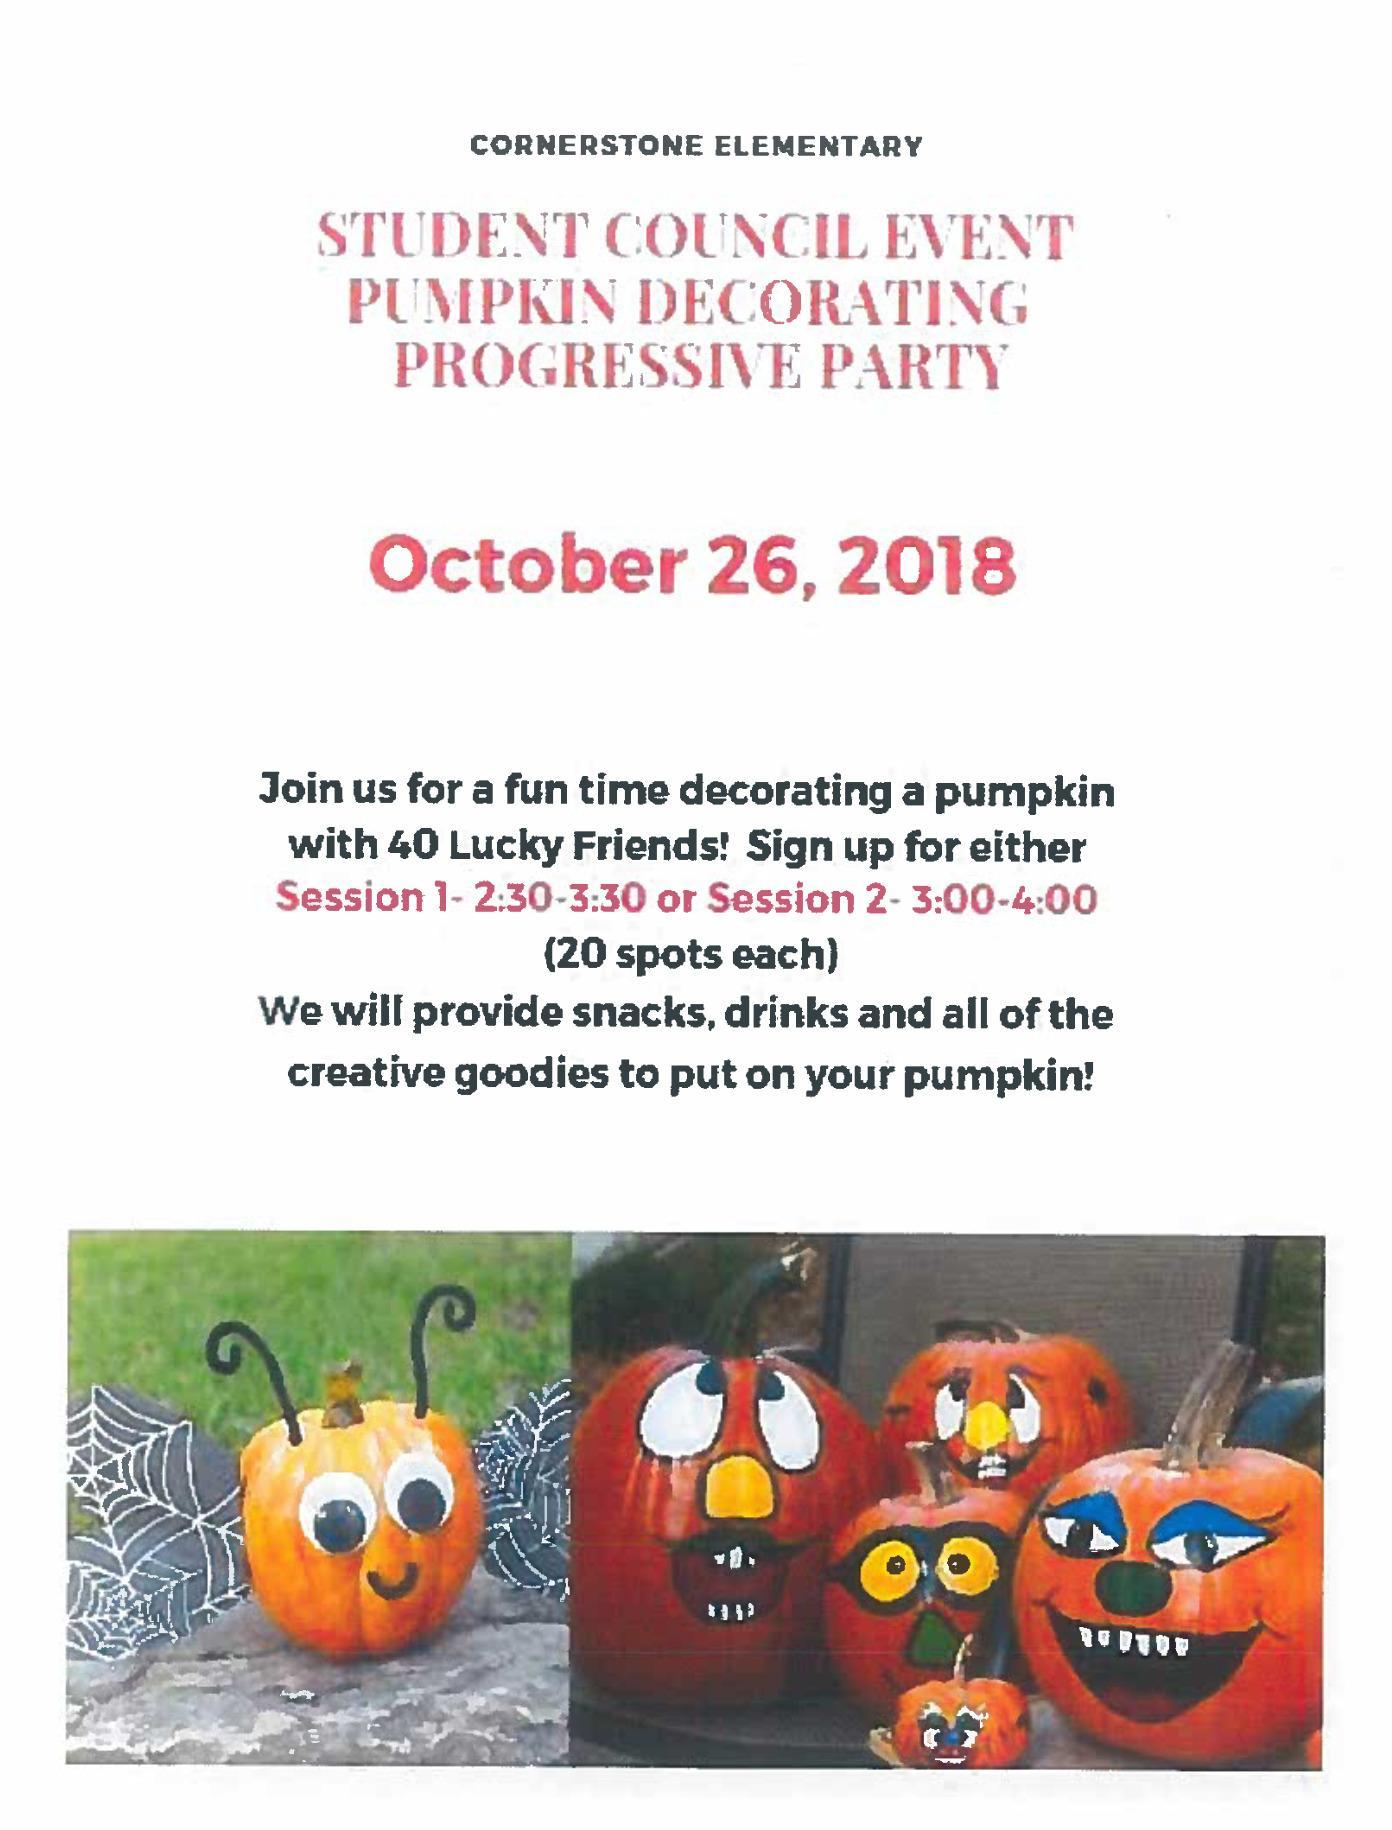 Pumpkin Decorating Party Flyer